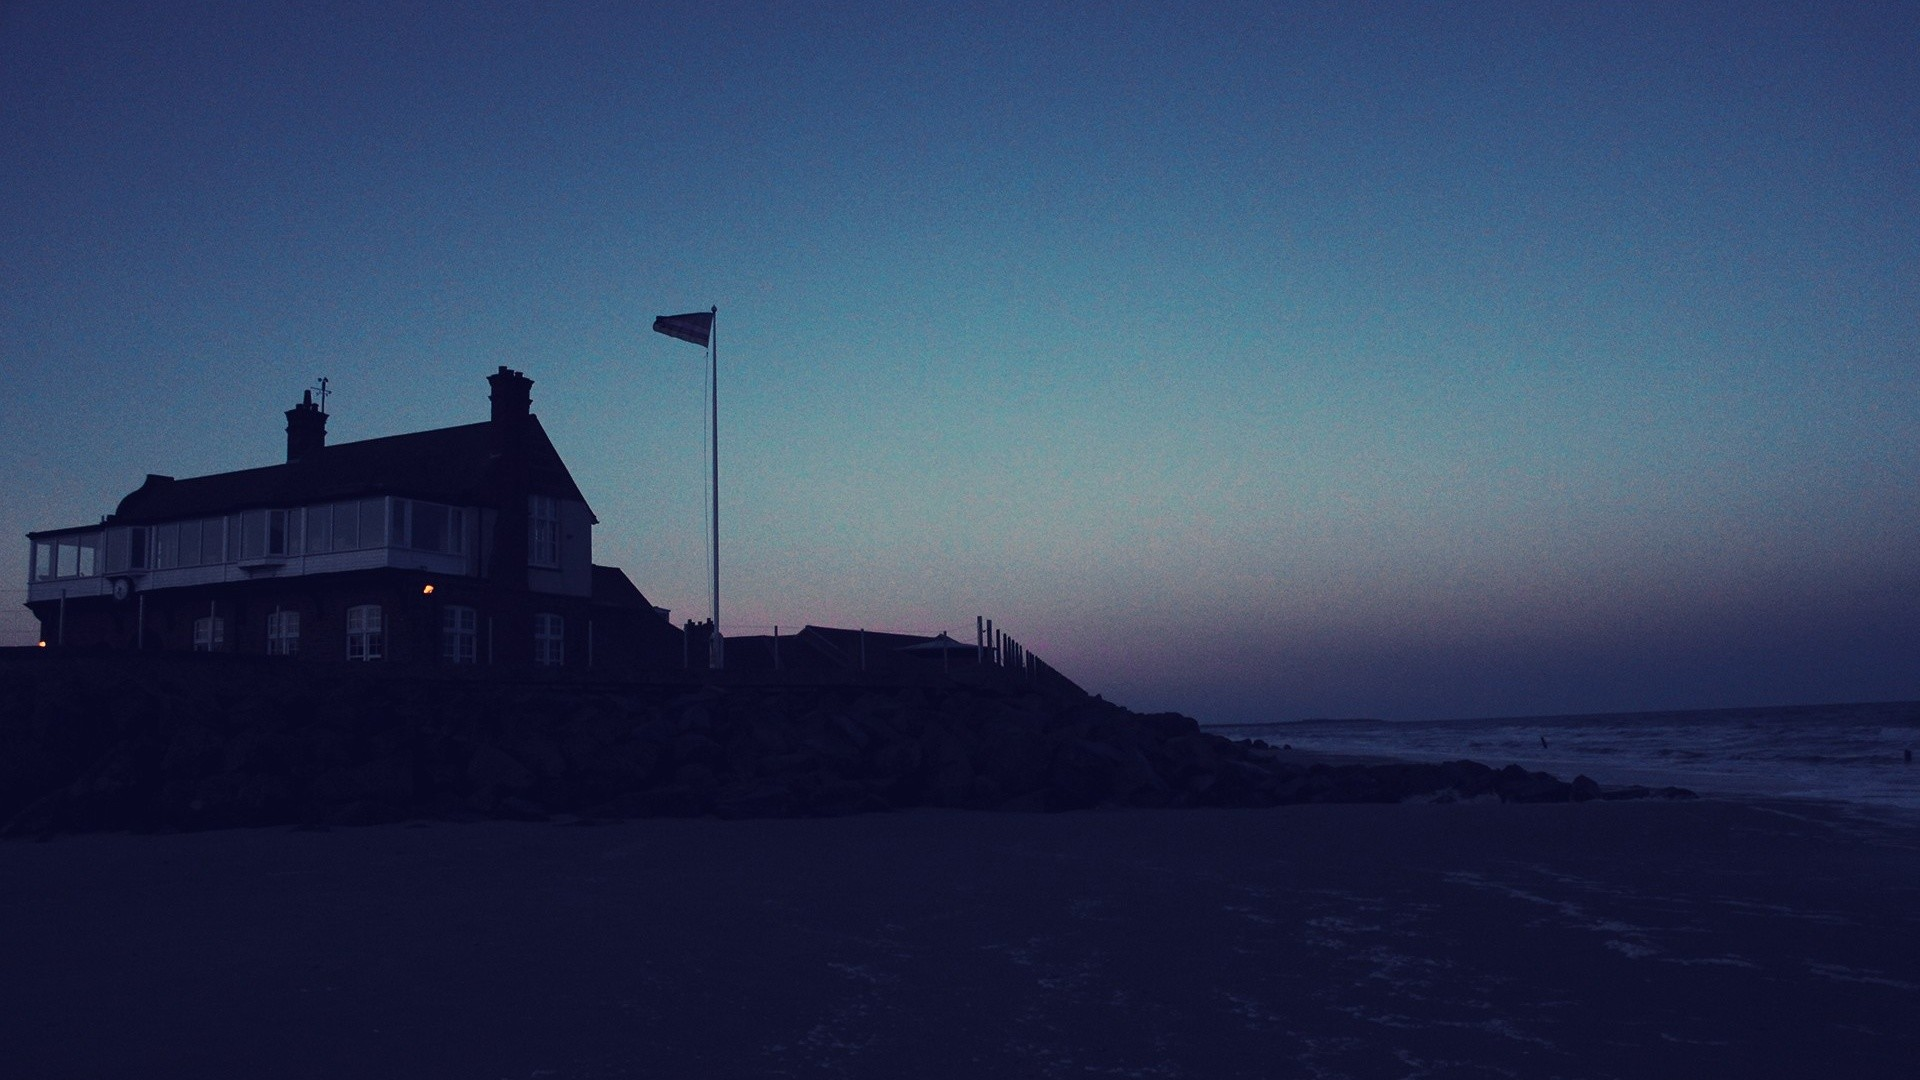 HD Beach At Night Wallpapers | PixelsTalk.Net